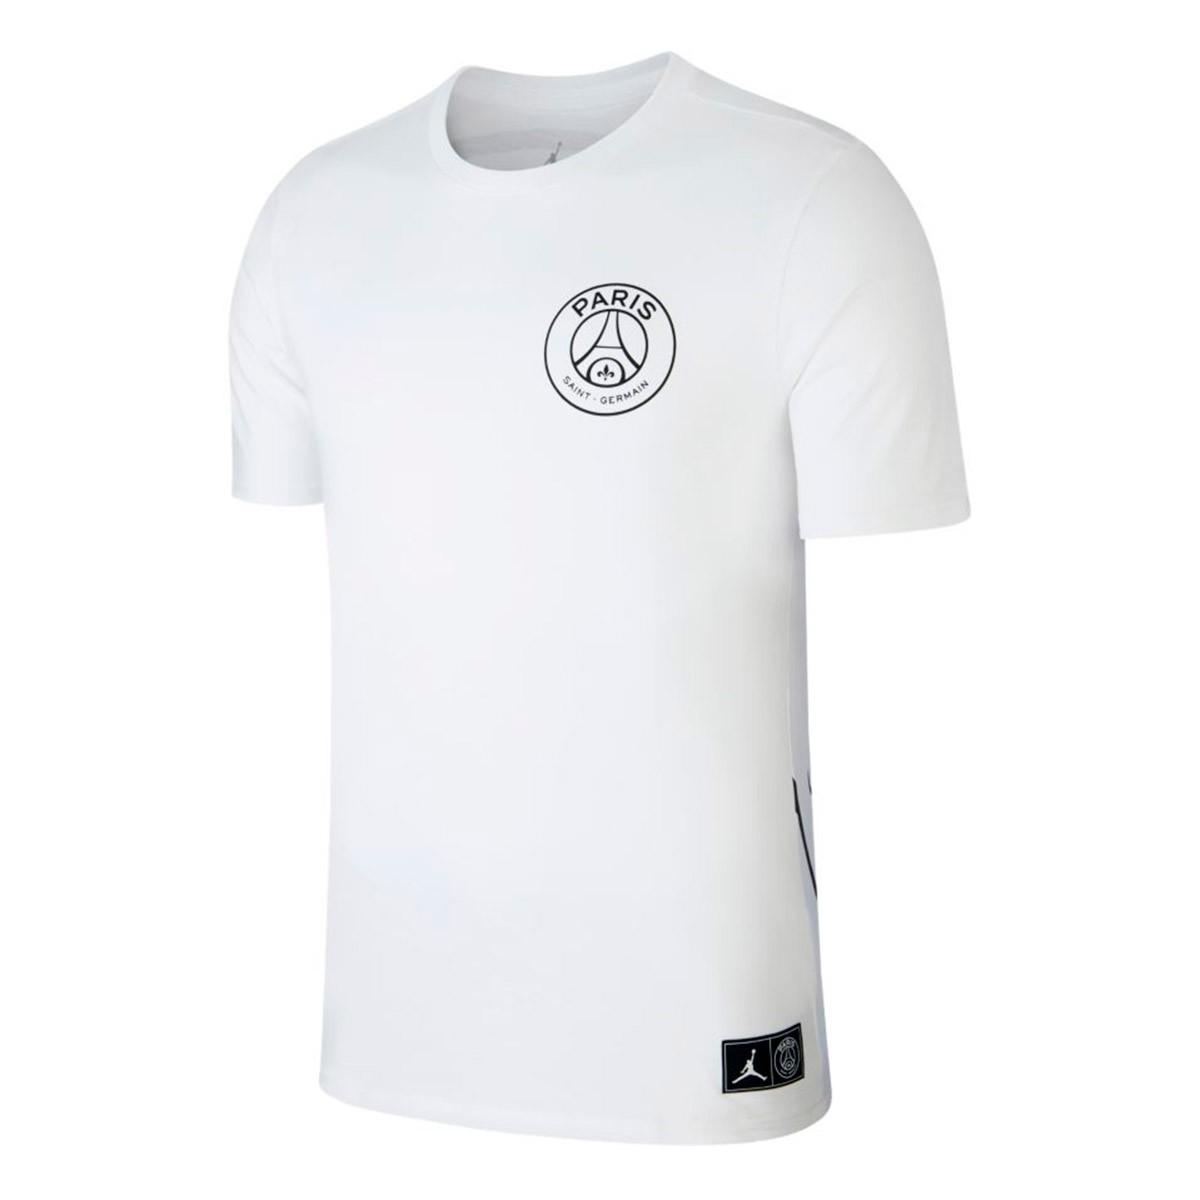 cb31bab696a Jersey Nike Jordan x PSG Logo White-Black - Leaked soccer